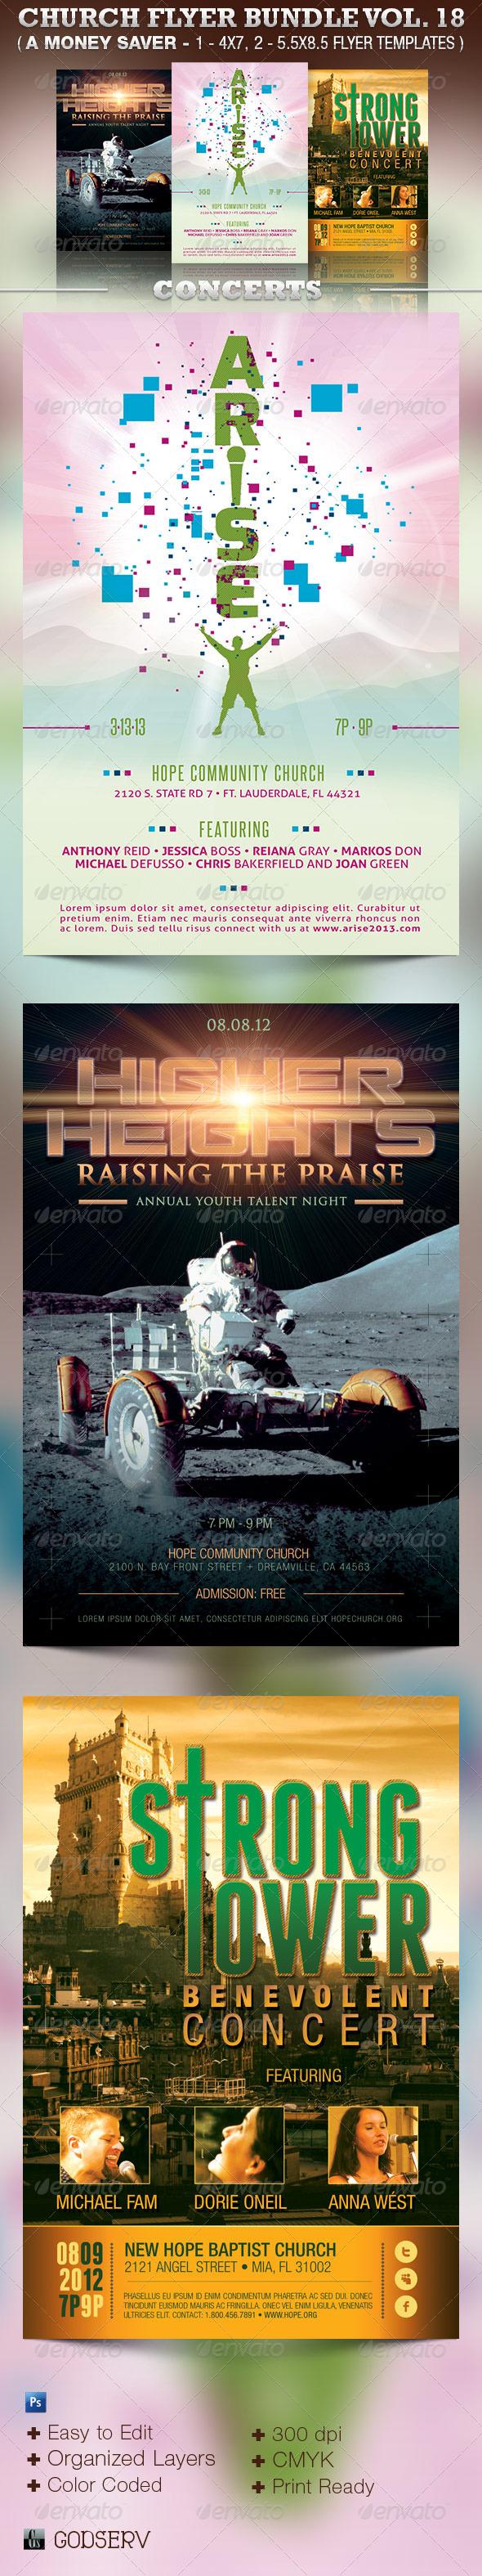 Concert Church Flyer Template Bundle Vol 18 - Church Flyers